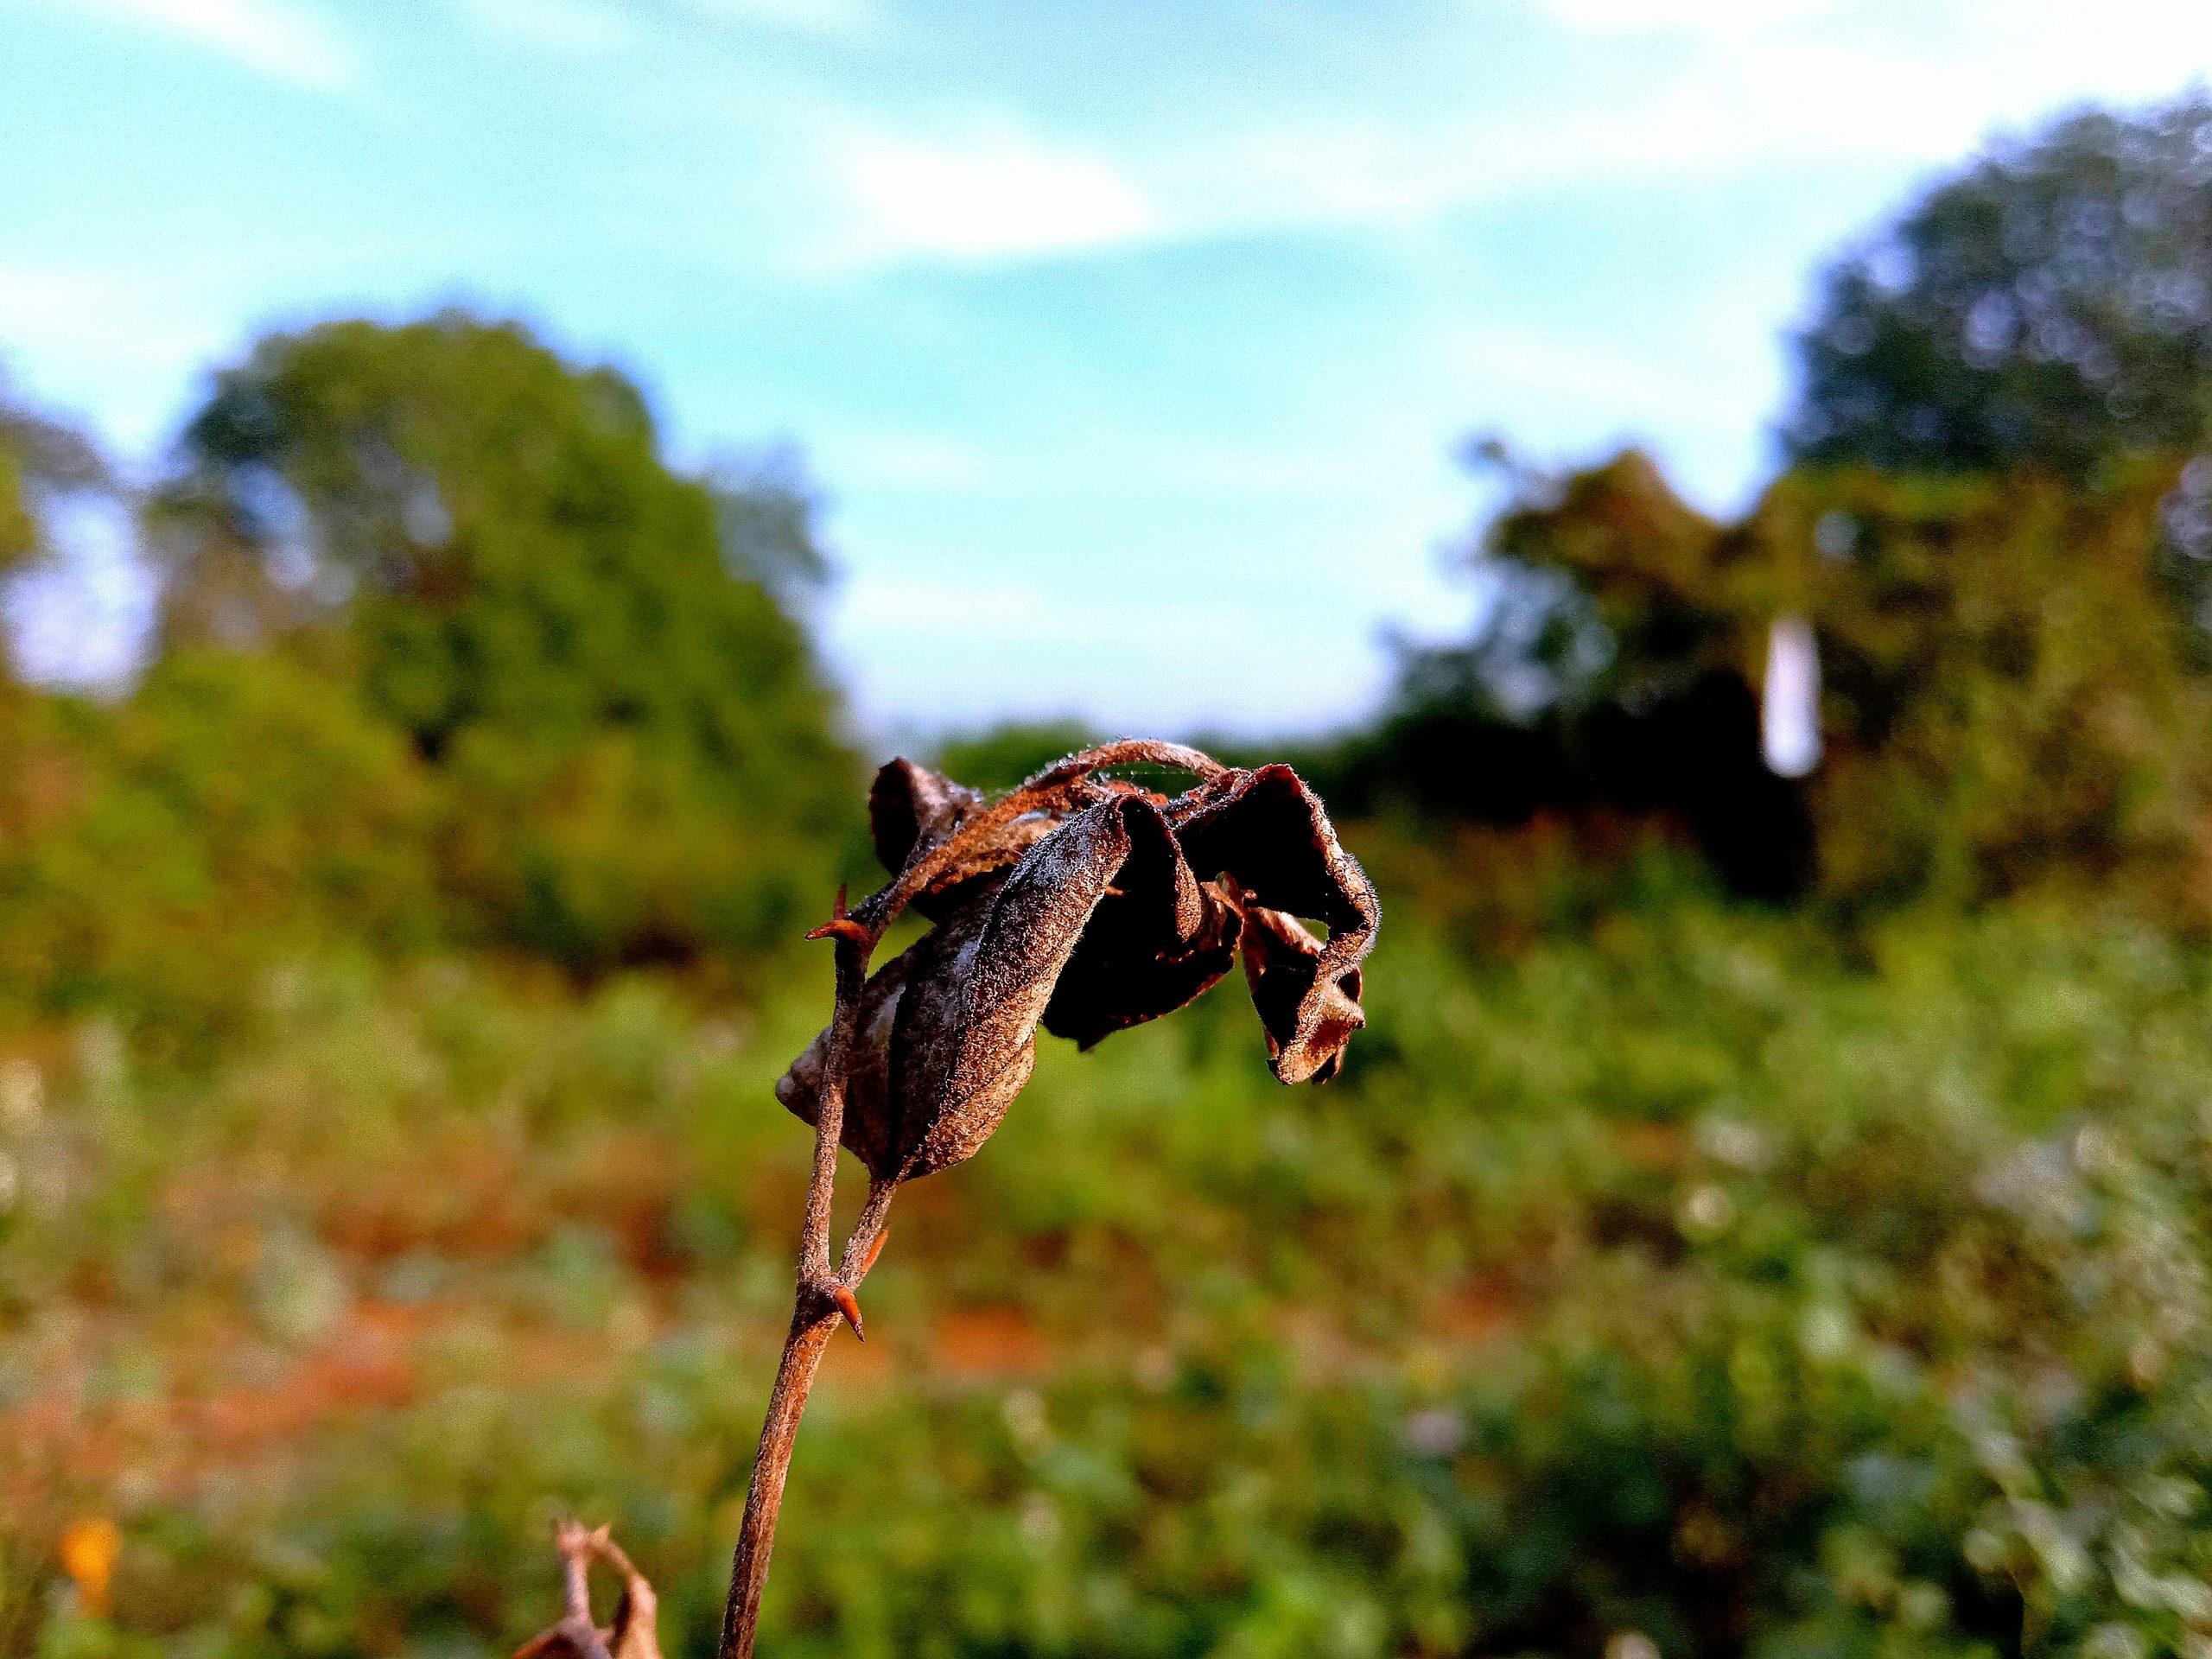 Dry leaf of a plant